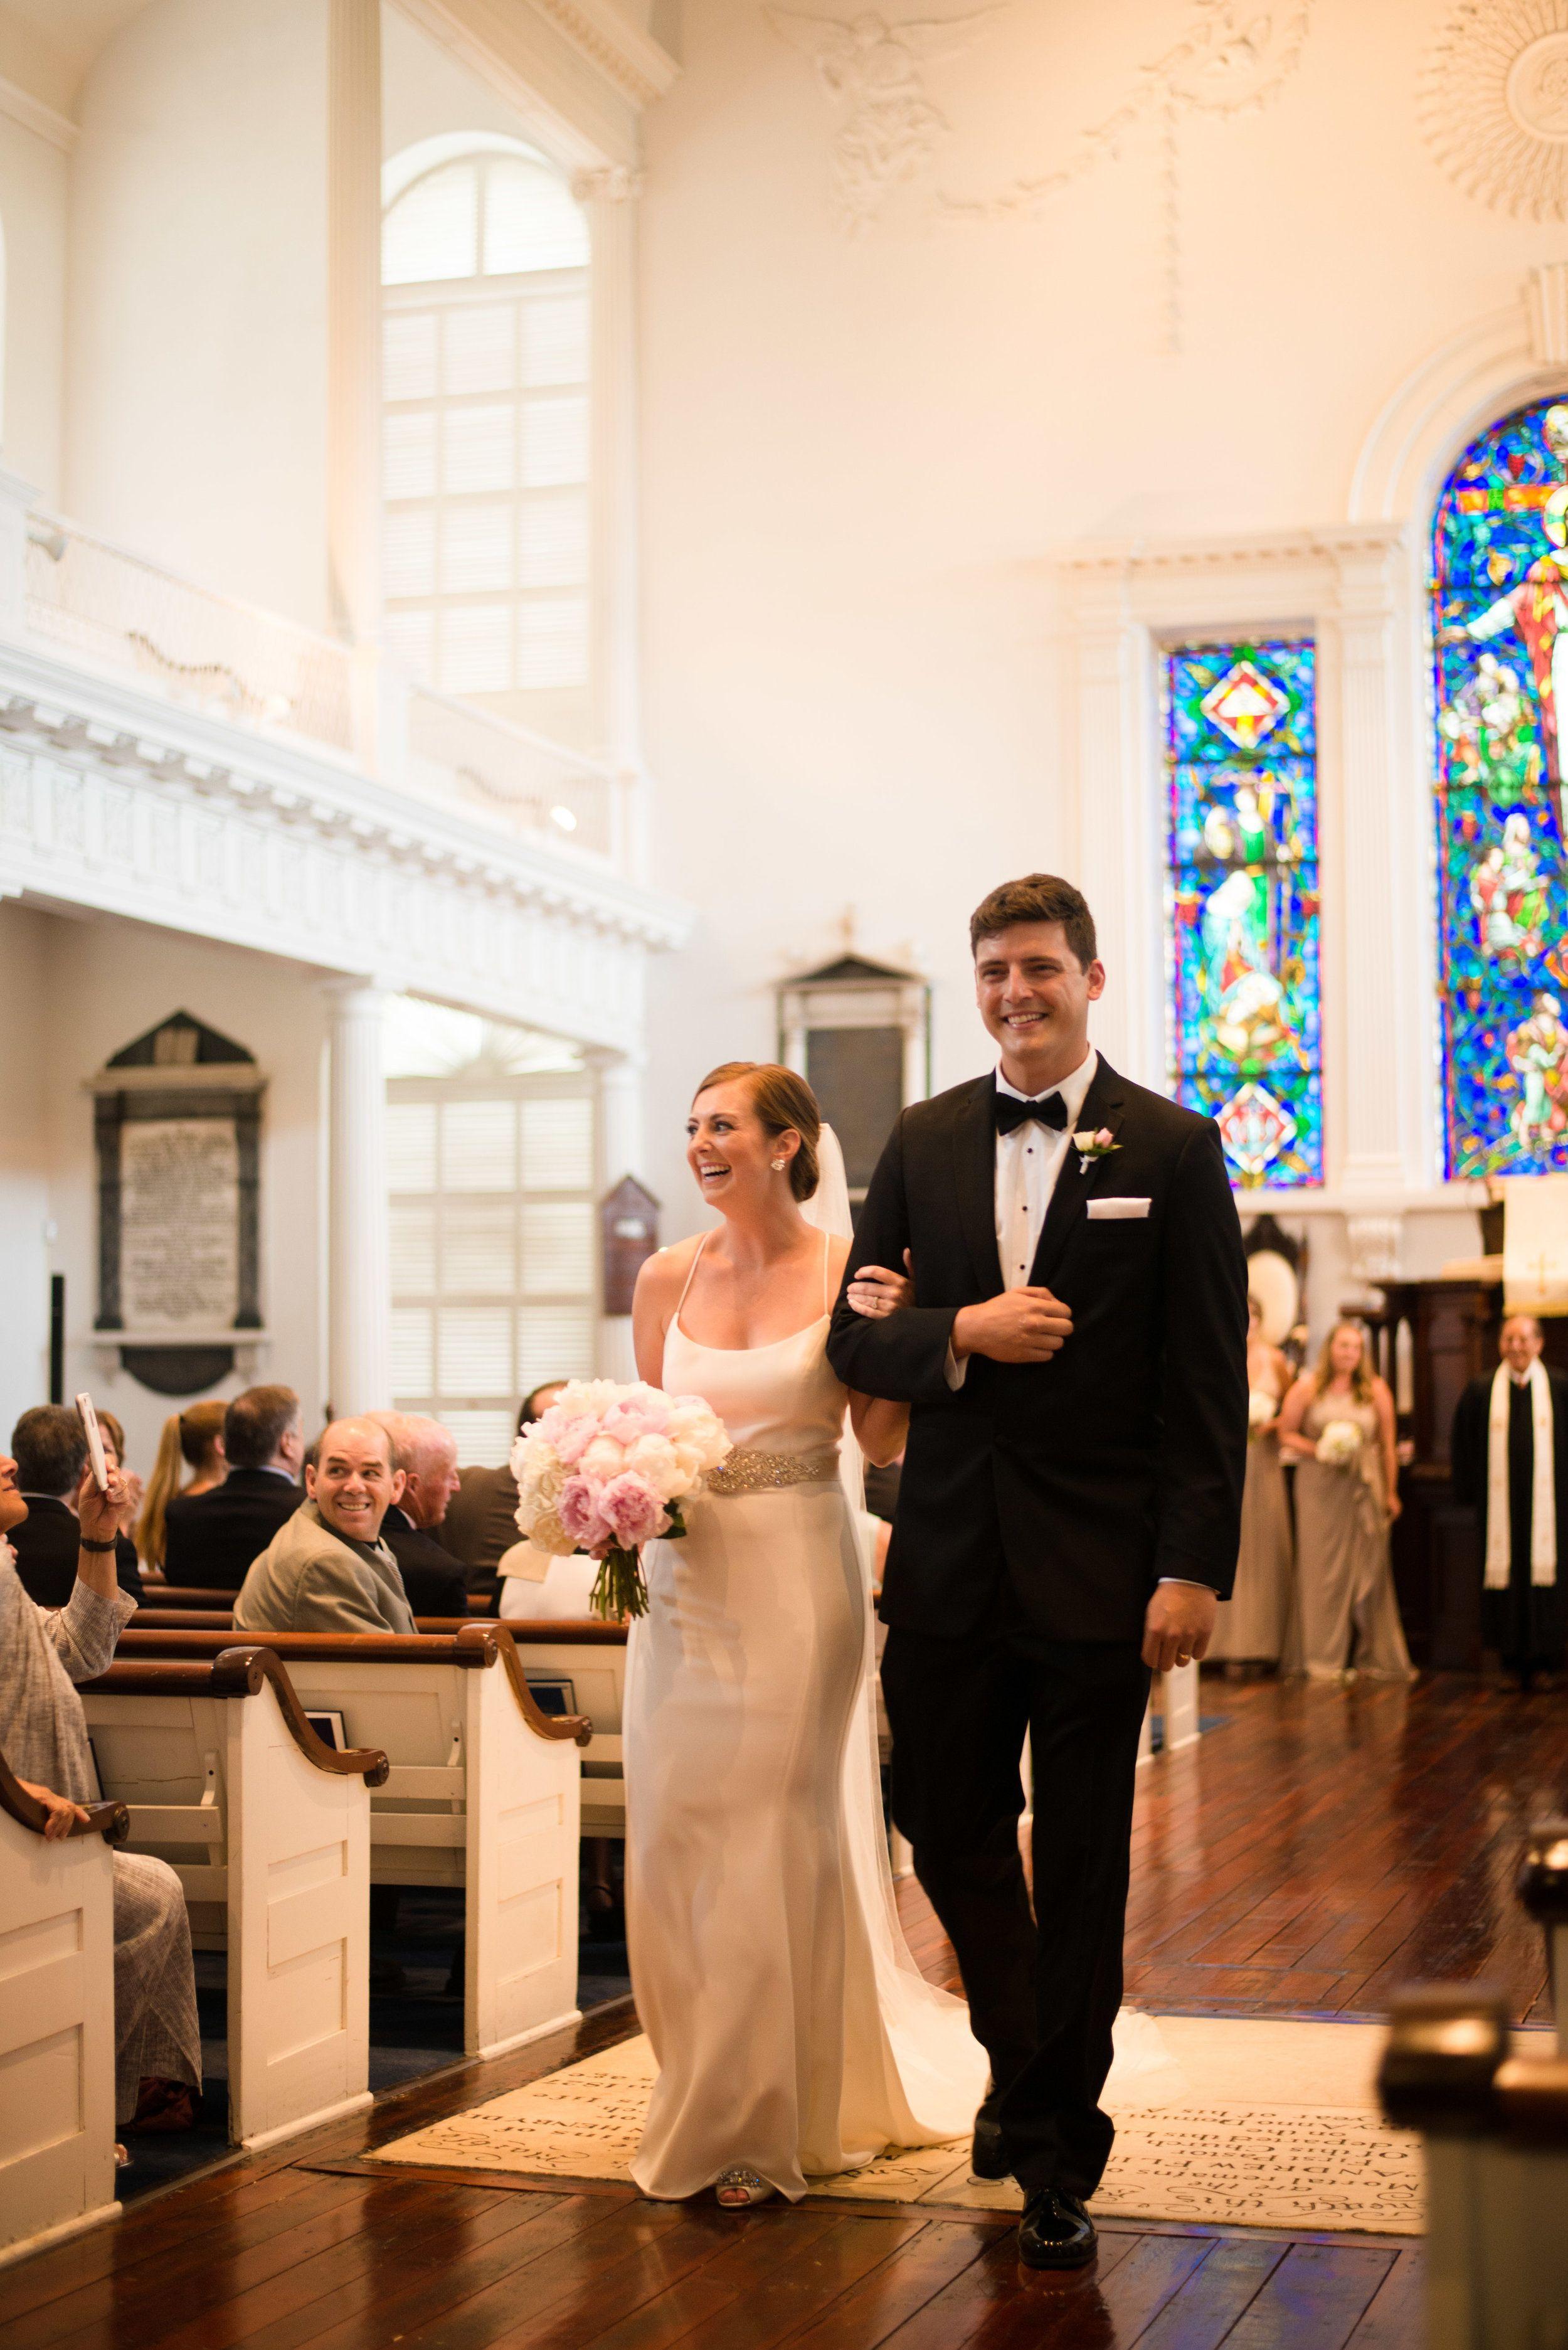 Chagne Downtown Charleston Wedding Summer Ideas Venues: Downtown Charleston Wedding Venues At Reisefeber.org